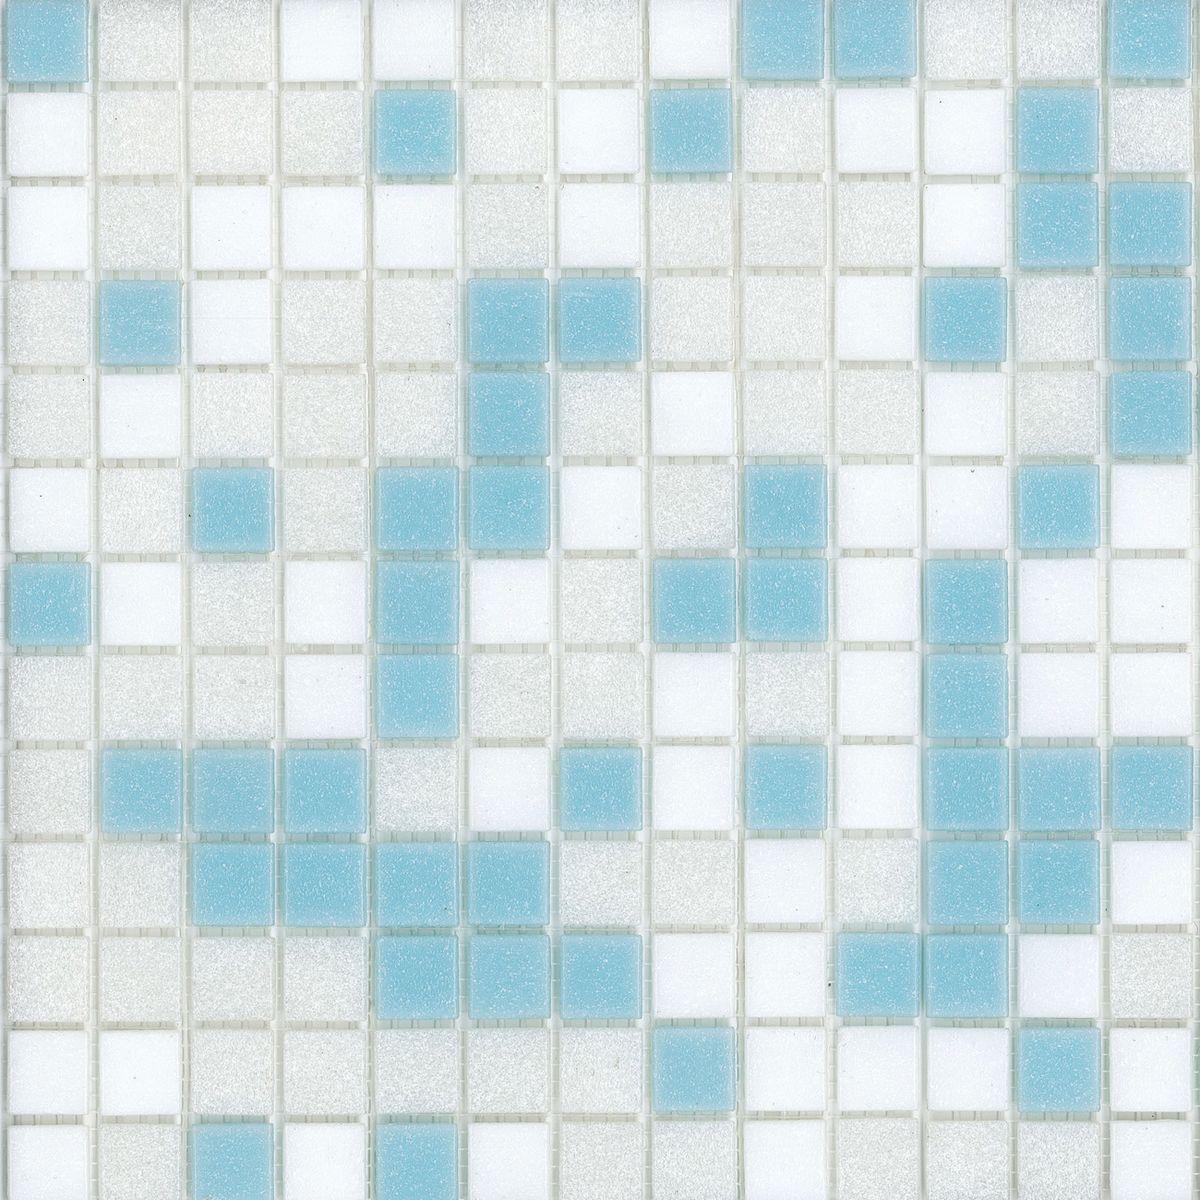 Piastrelle bagno mosaico azzurro yl85 regardsdefemmes - Piastrelle mosaico leroy merlin ...